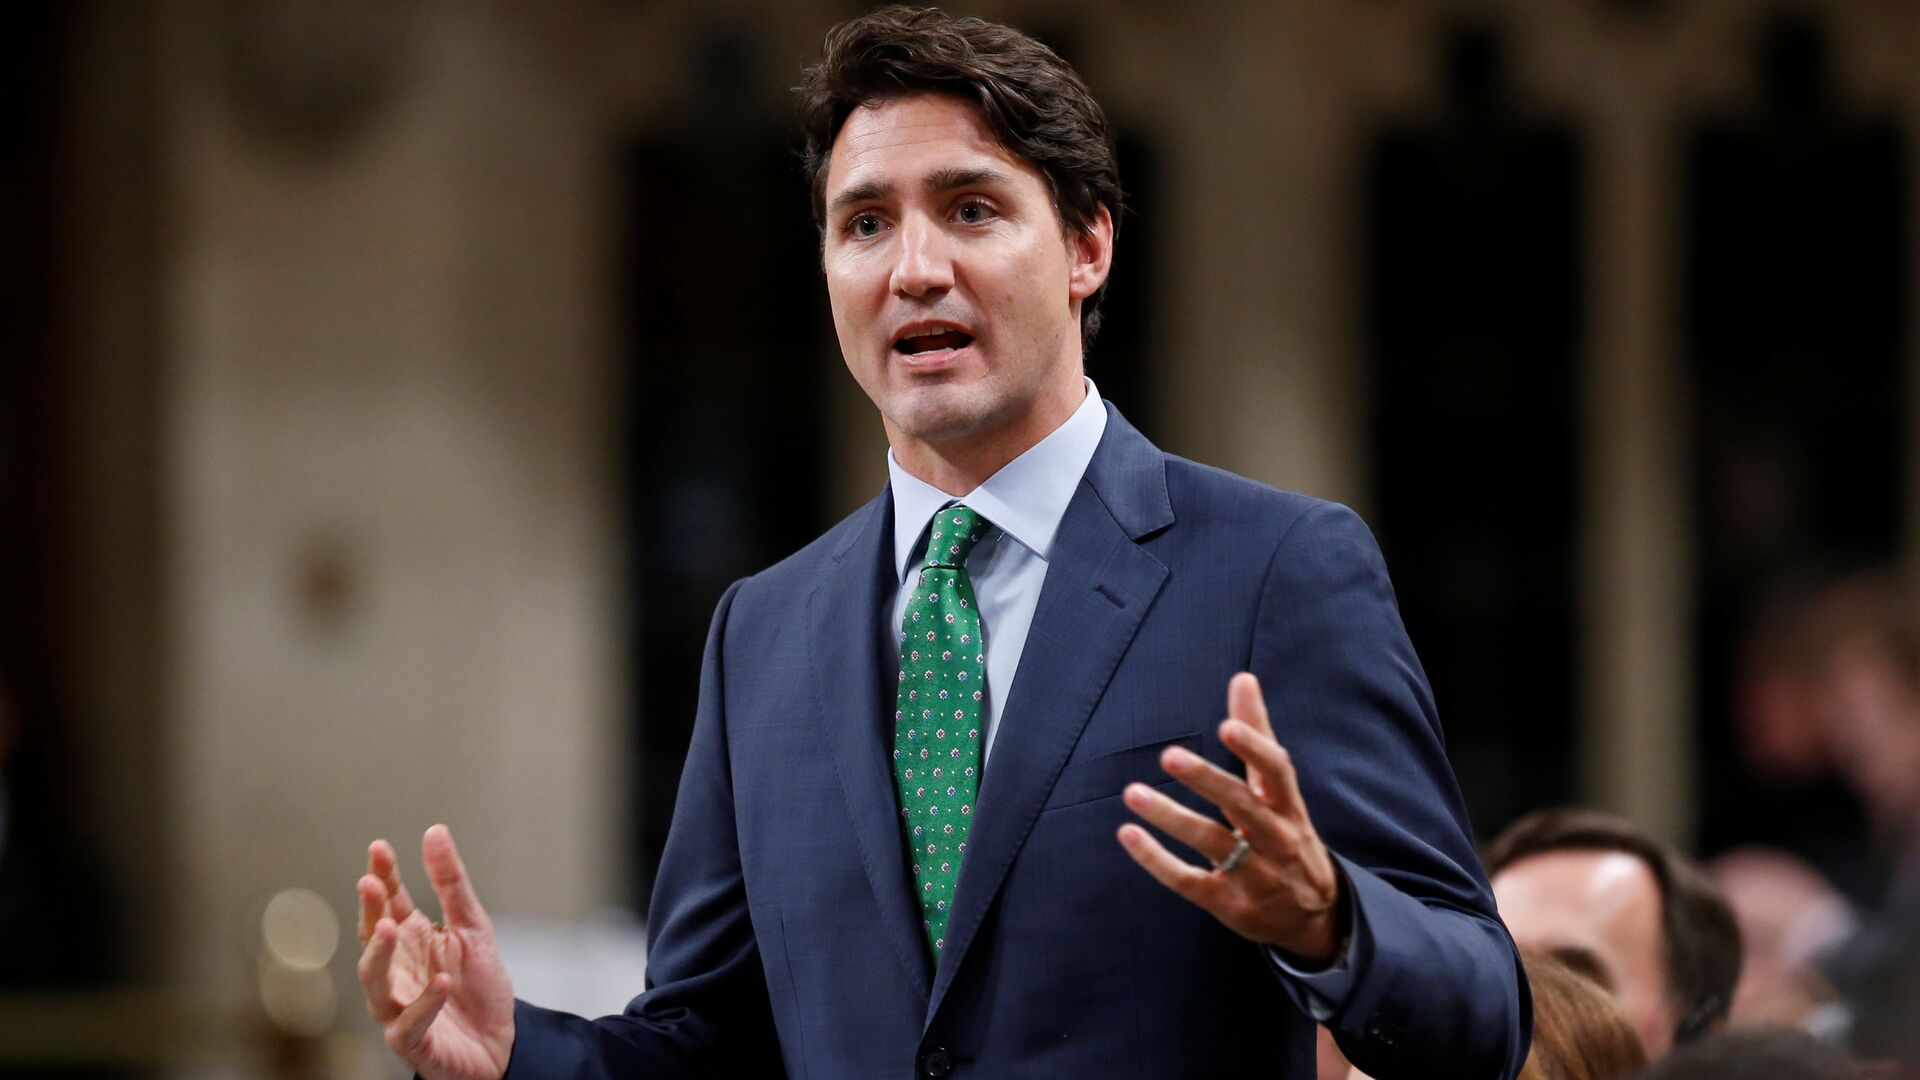 Justin Trudeau, pimer ministro de Canadá - Sputnik Mundo, 1920, 08.06.2021